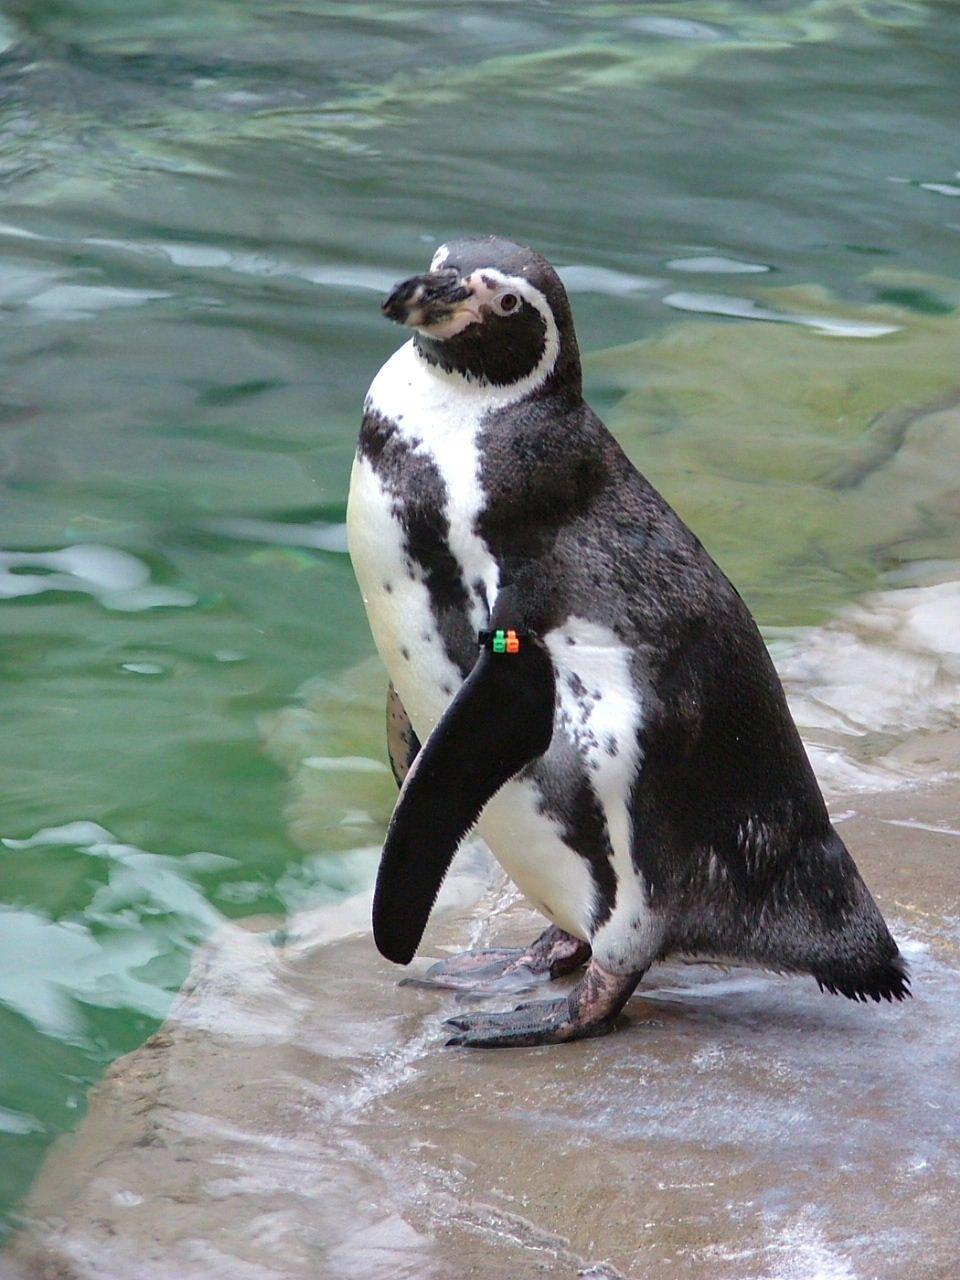 Amigo the Humboldt Penguin at the Akron Zoo